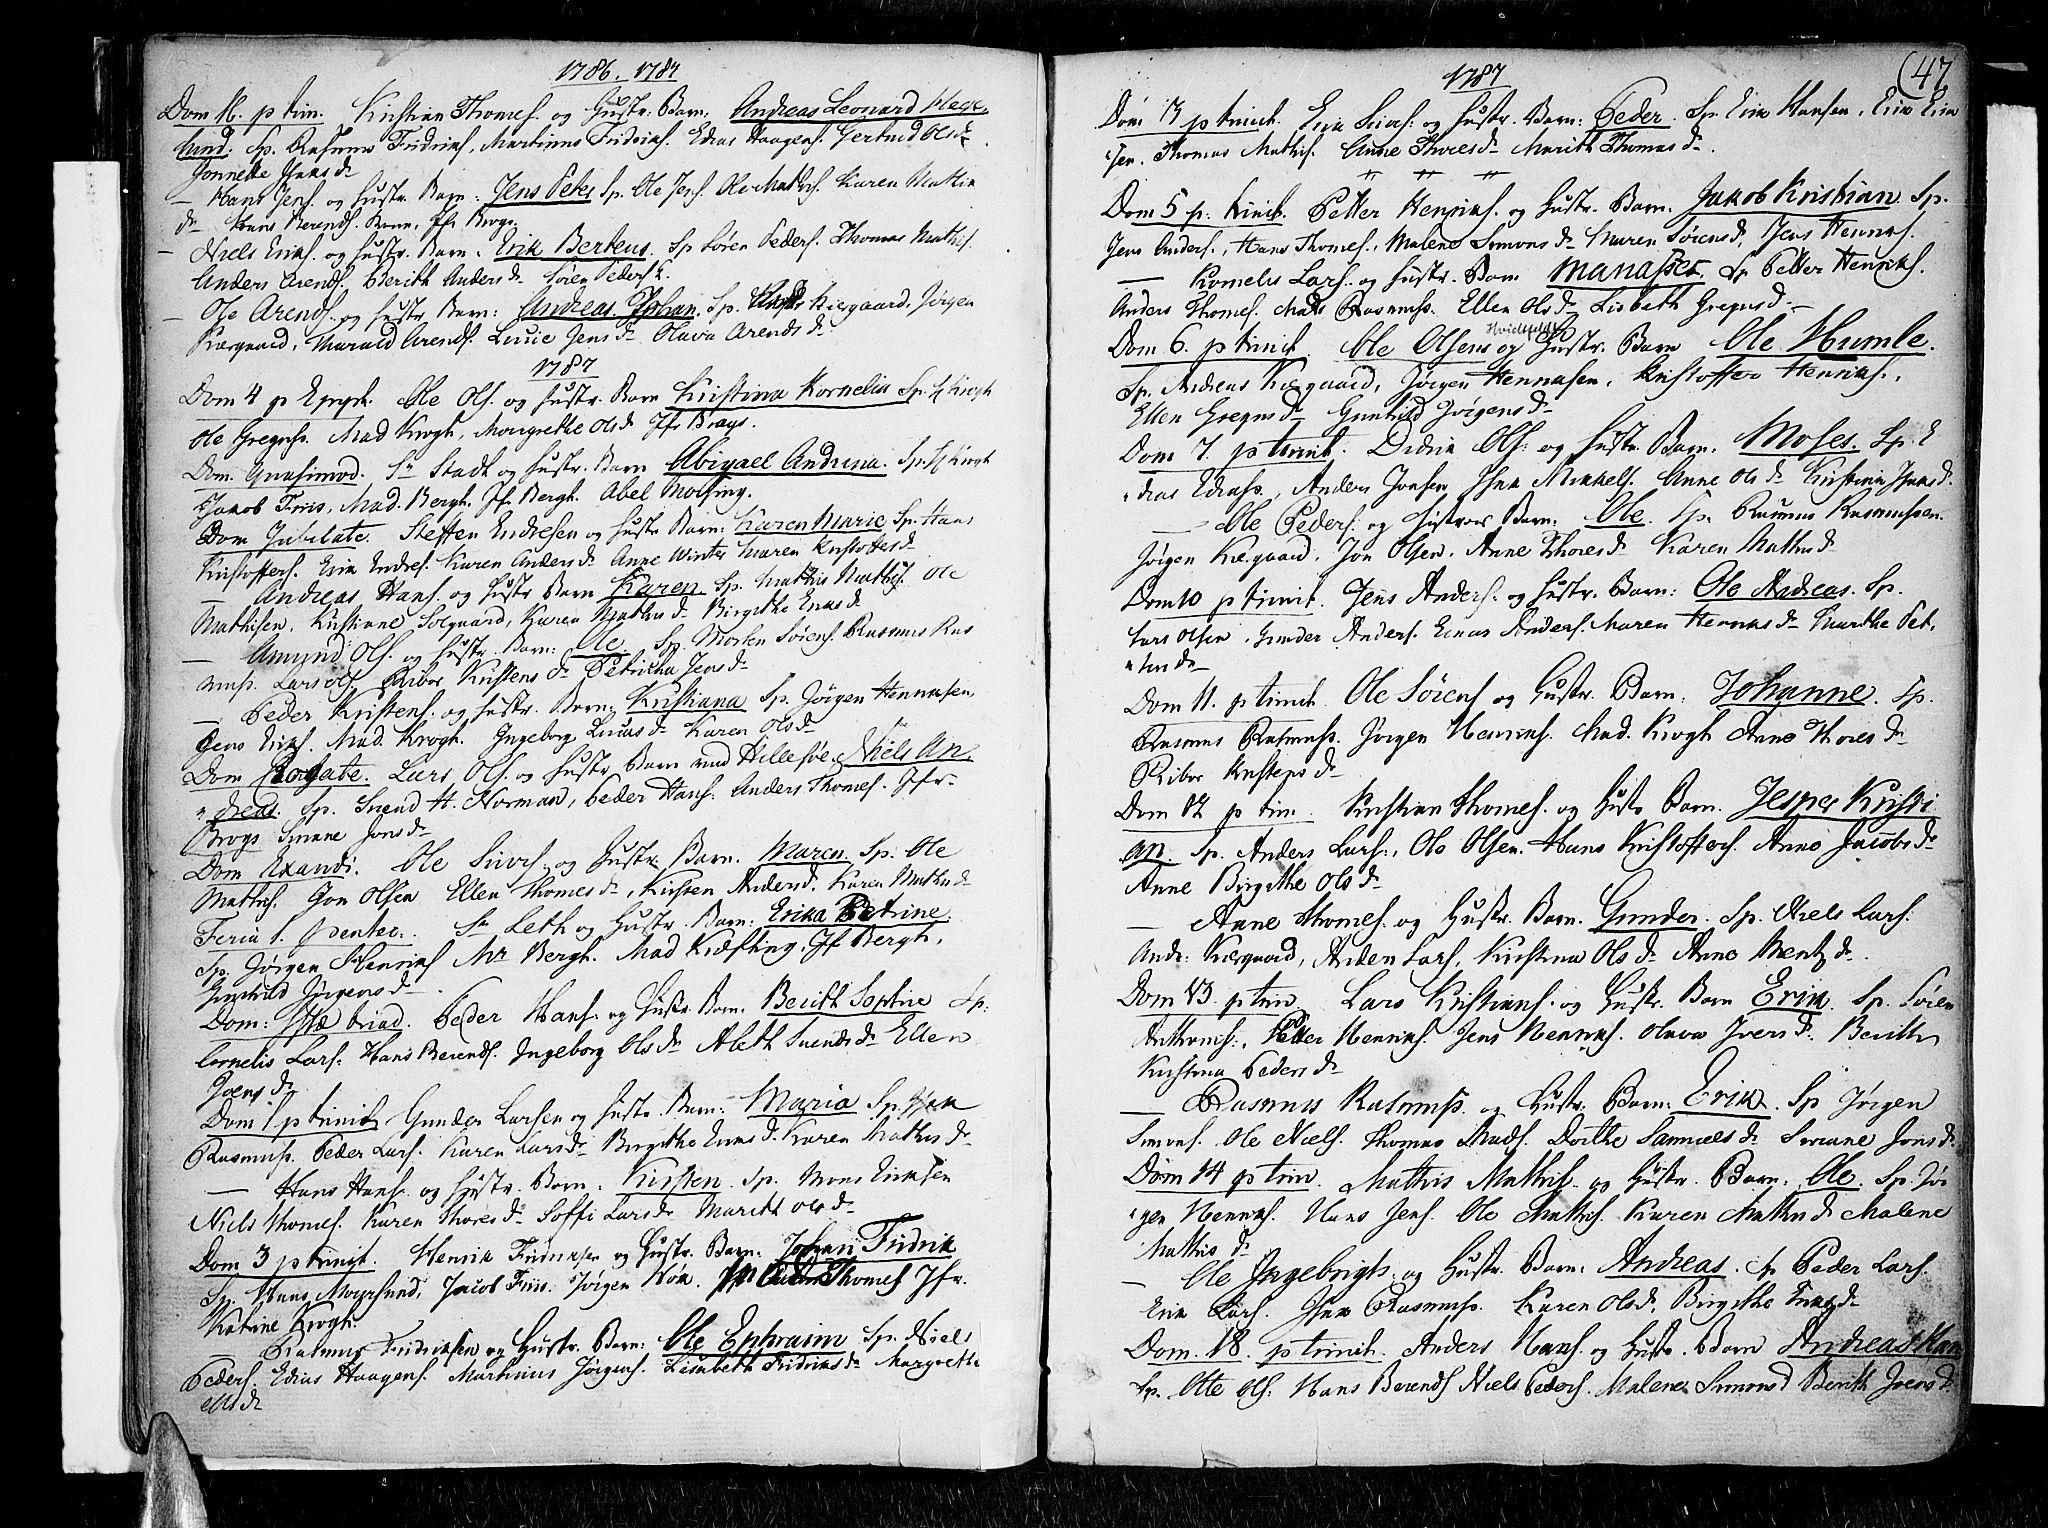 SATØ, Lenvik sokneprestembete, H/Ha/Haa/L0002kirke: Ministerialbok nr. 2, 1784-1820, s. 47